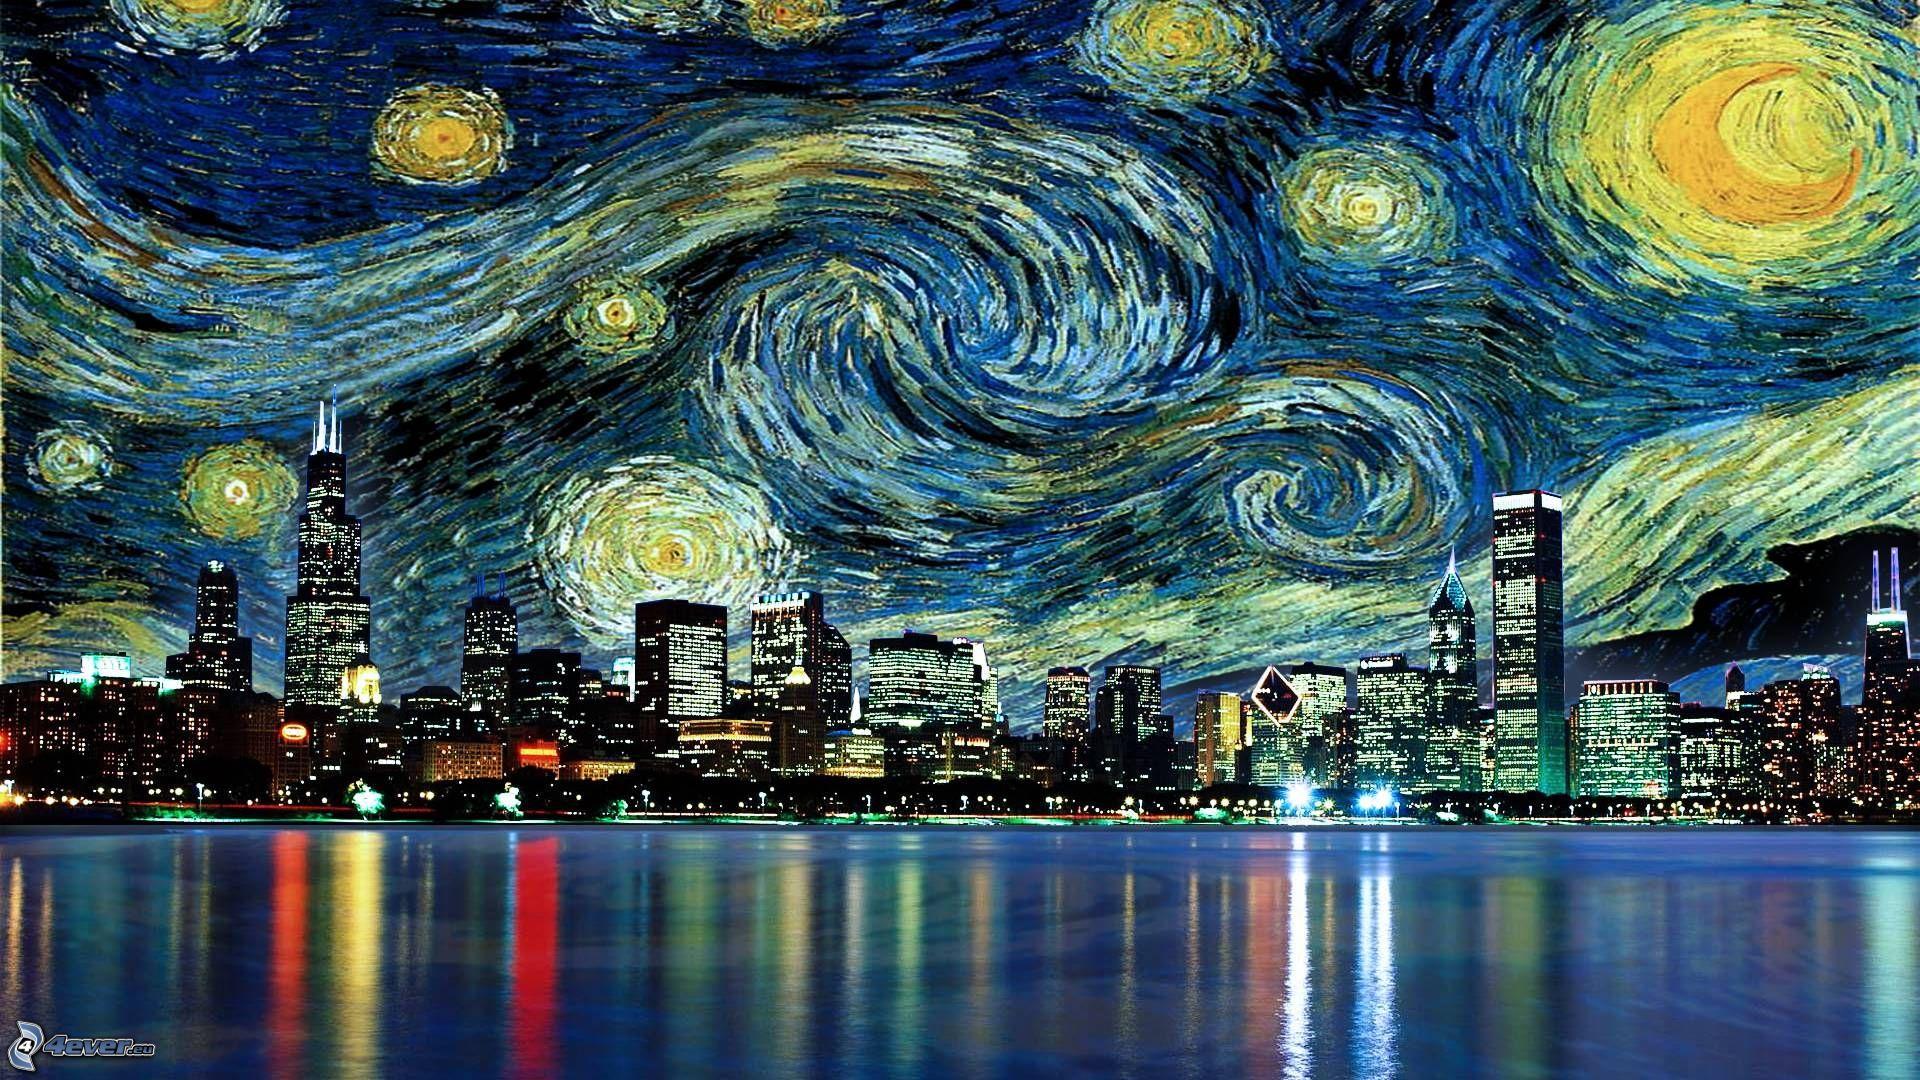 Vincent Van Gogh The Starry Night Starry Night Van Gogh Starry Night Wallpaper Gogh The Starry Night